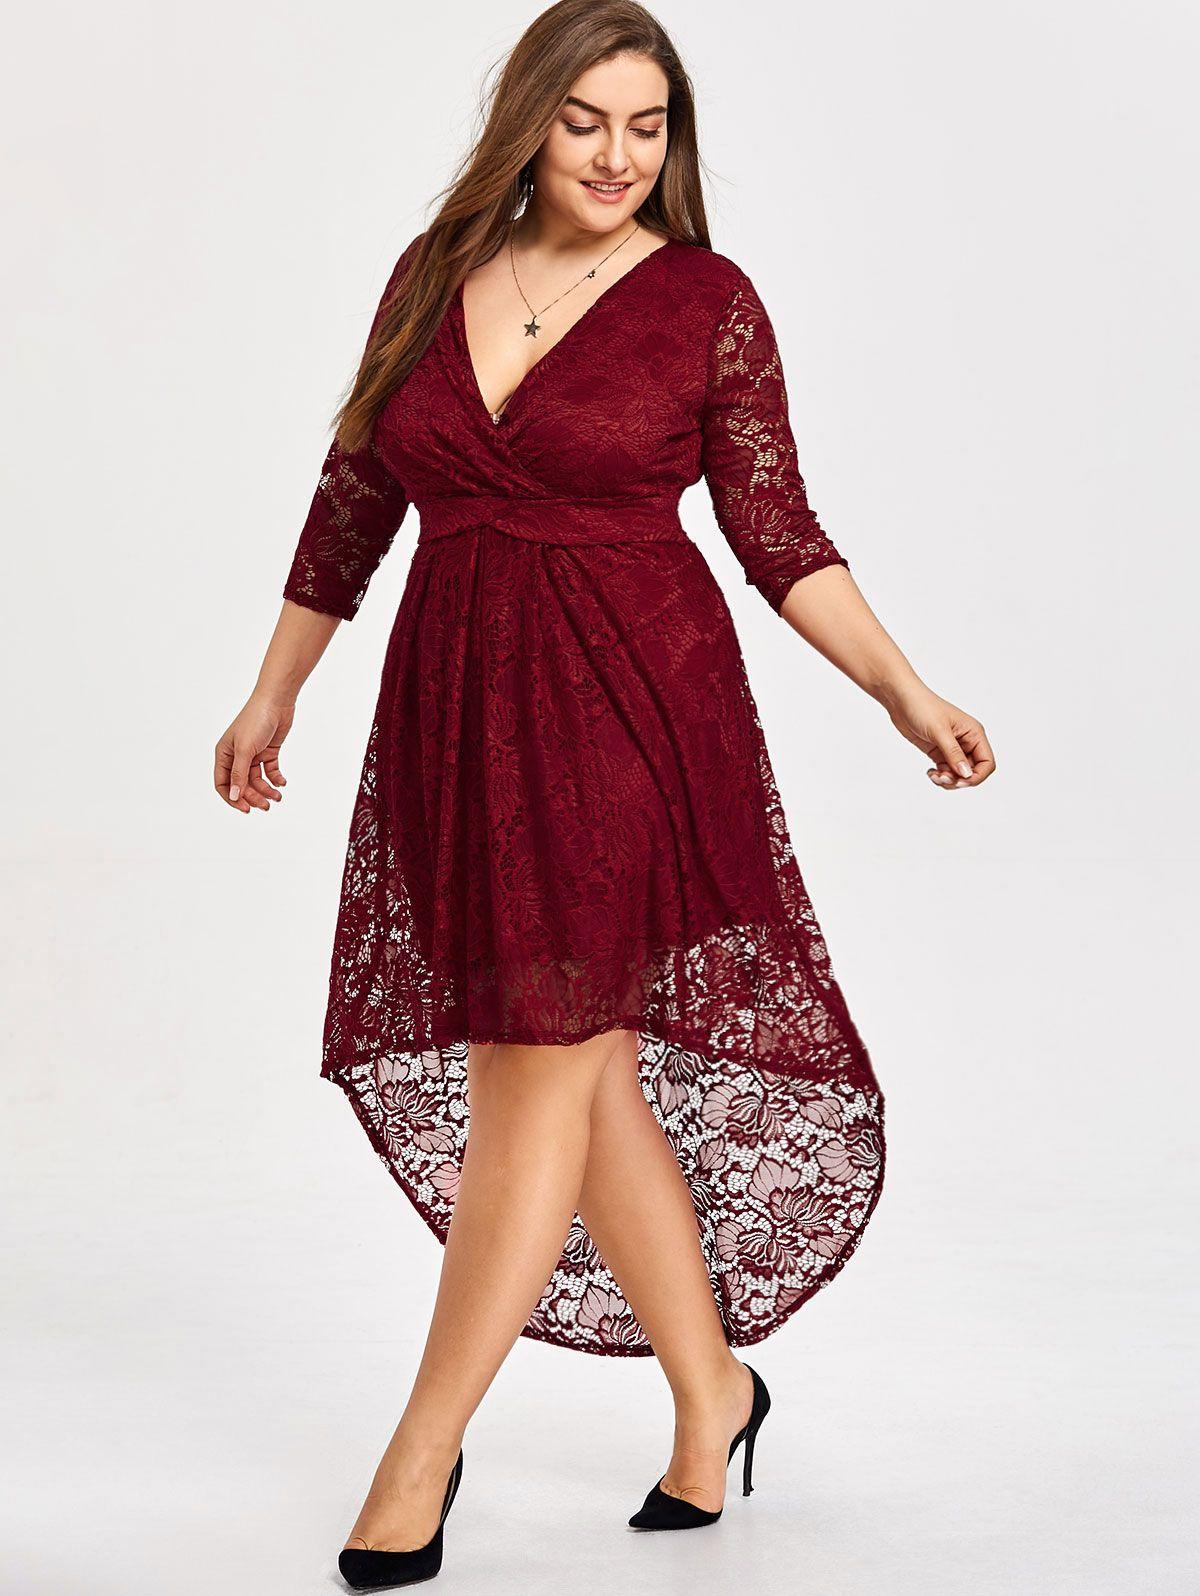 1bddc3f644 Plus Size High Low Lace Vintage Dress | Ariana grande | Dresses ...